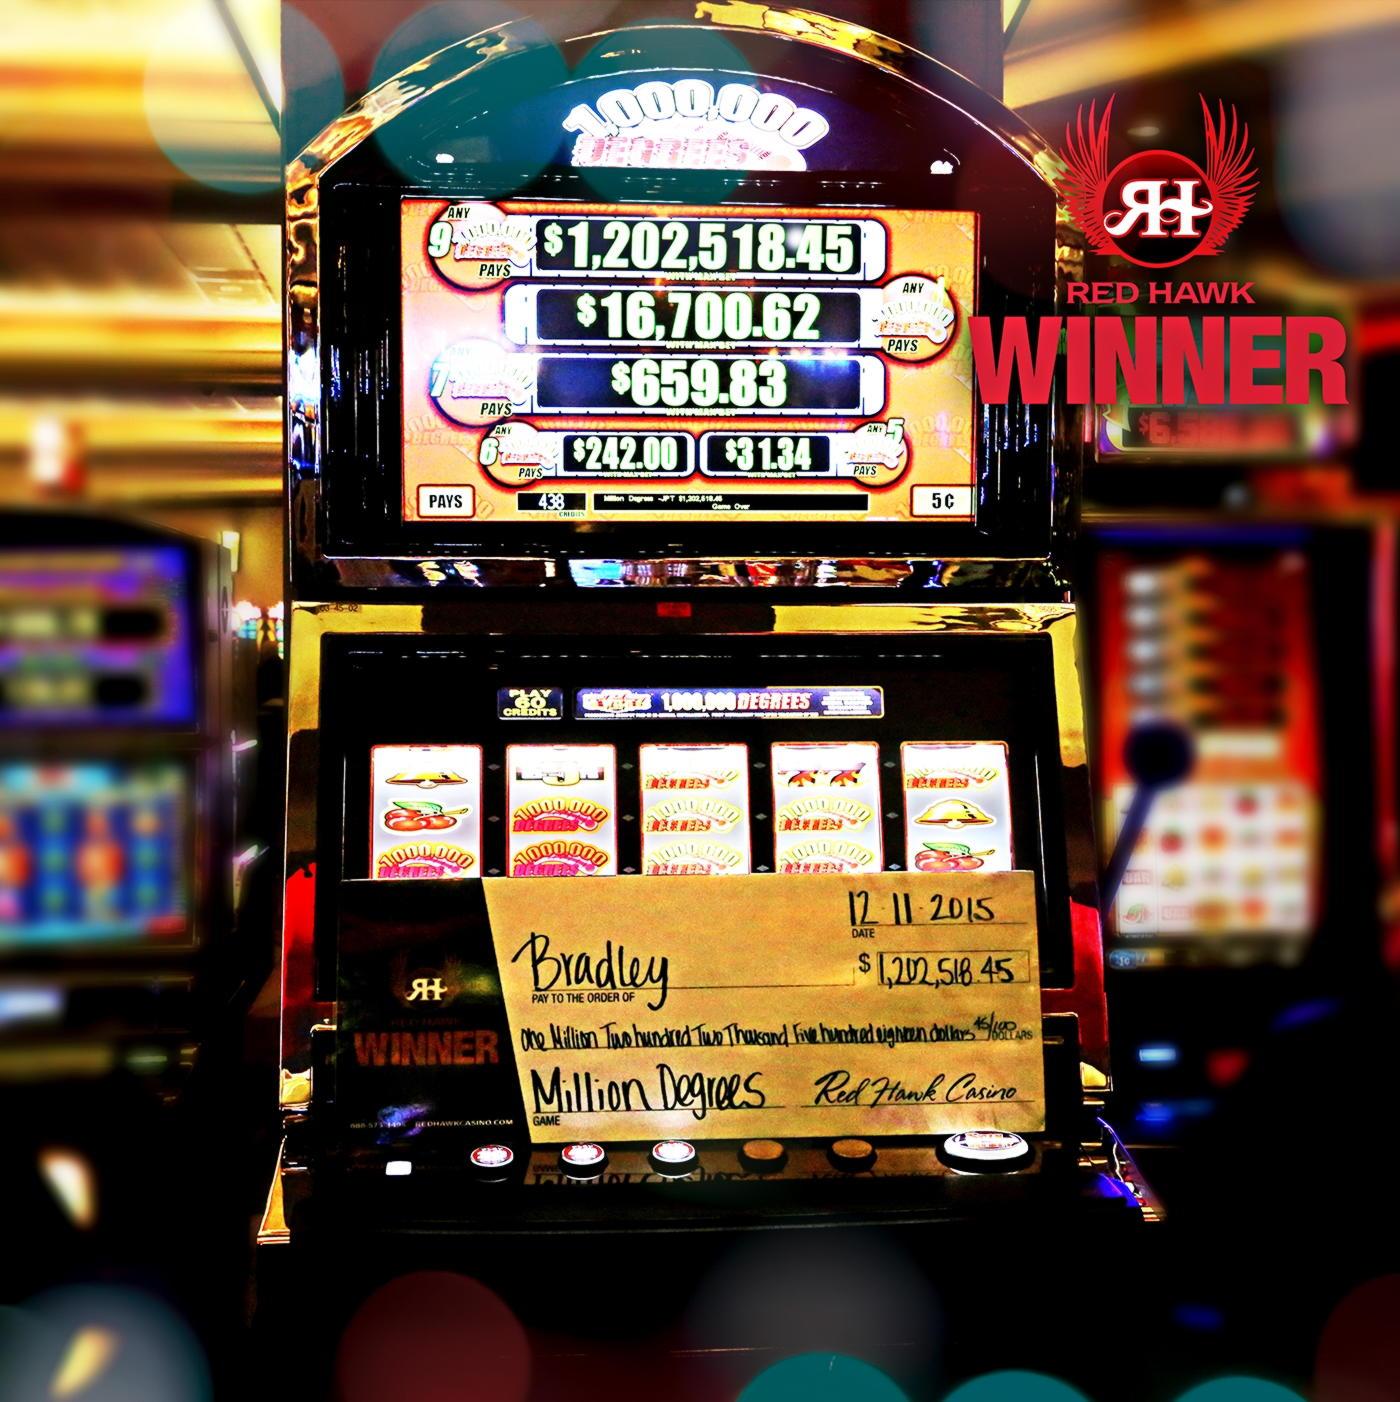 77 Loyal Free Spins! a Black Lotus Casino